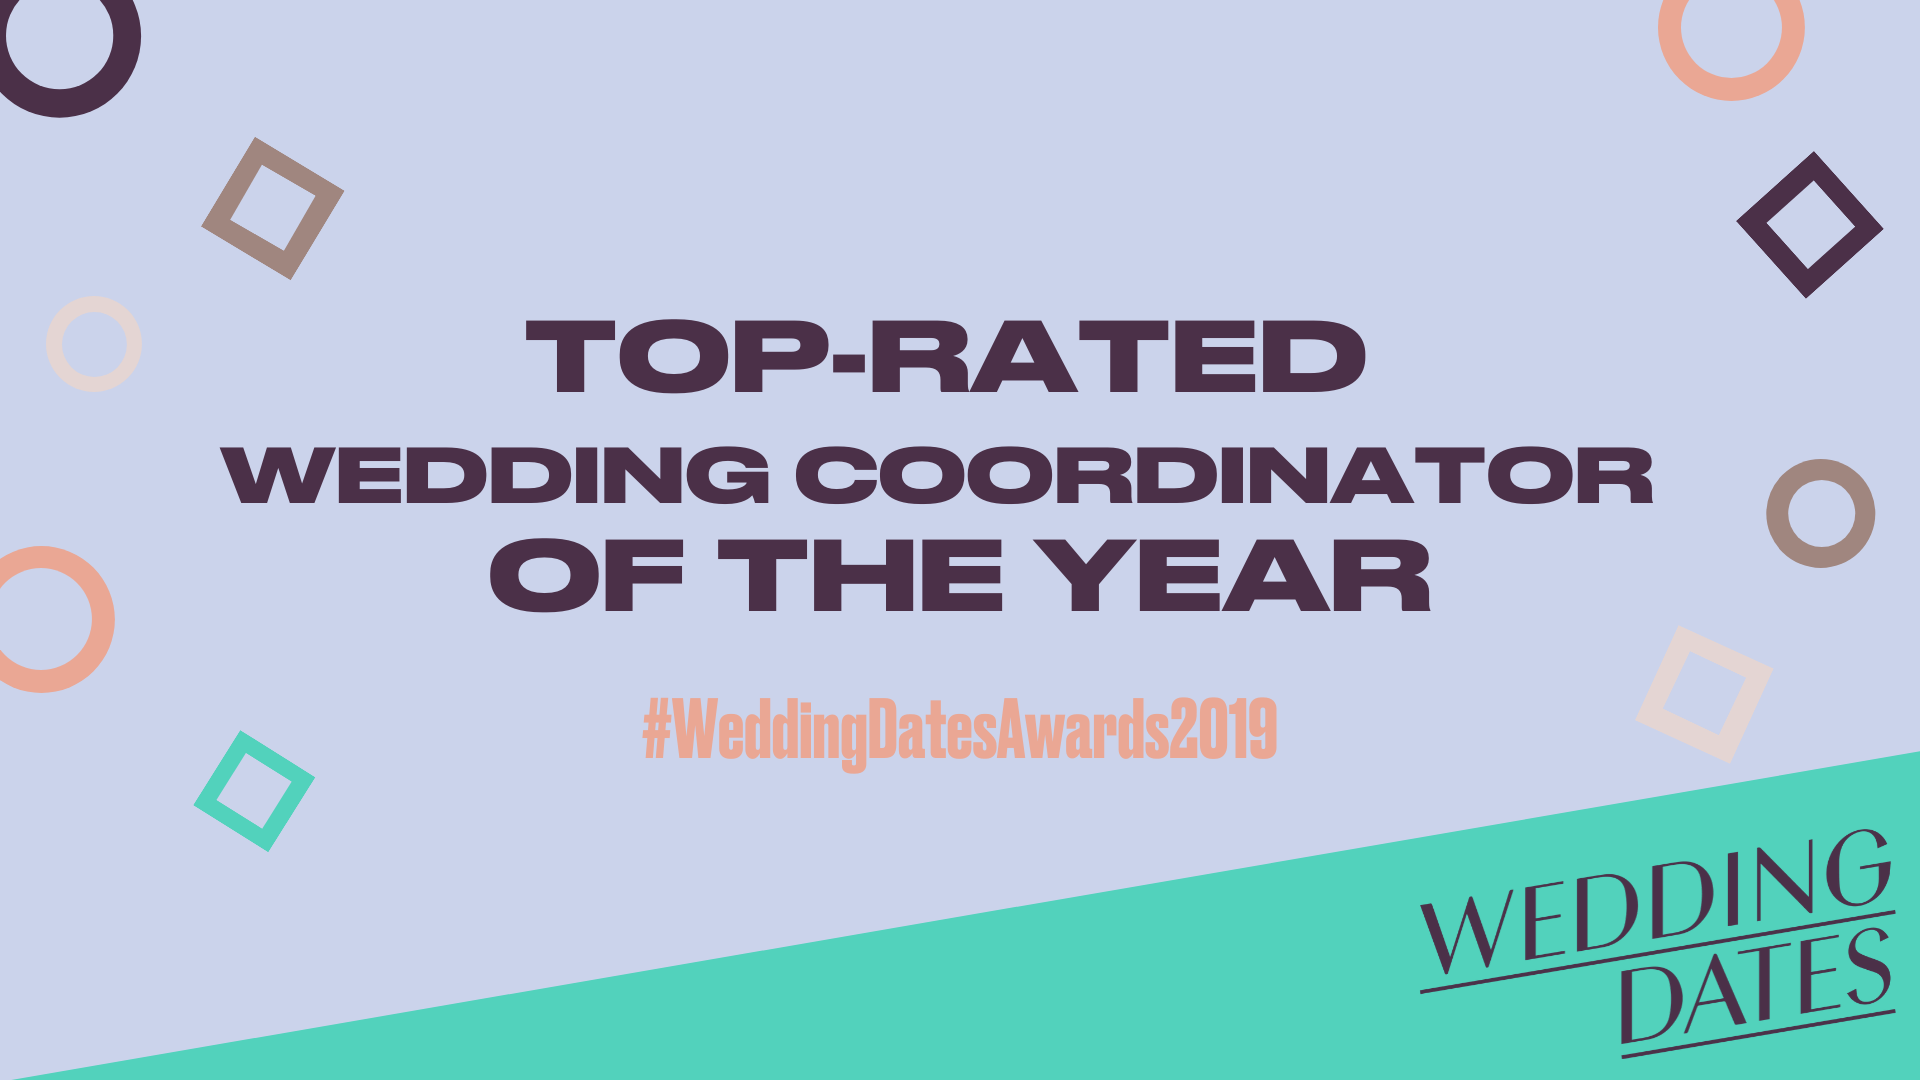 WeddingDates Awards 2019 - Top Wedding Coordinator Announced